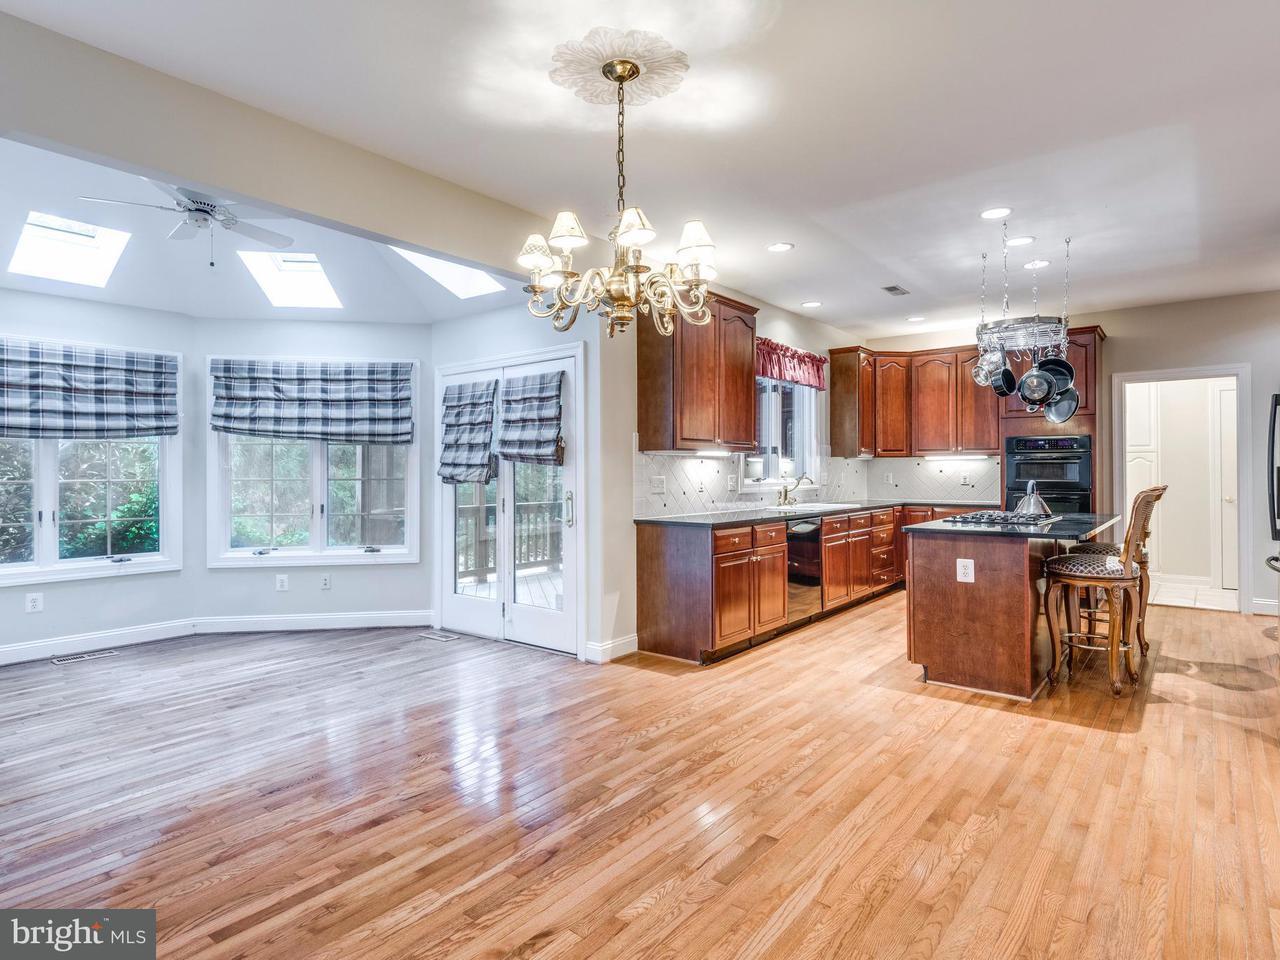 Single Family Home for Sale at 1115 AMANDA Drive 1115 AMANDA Drive Great Falls, Virginia 22066 United States